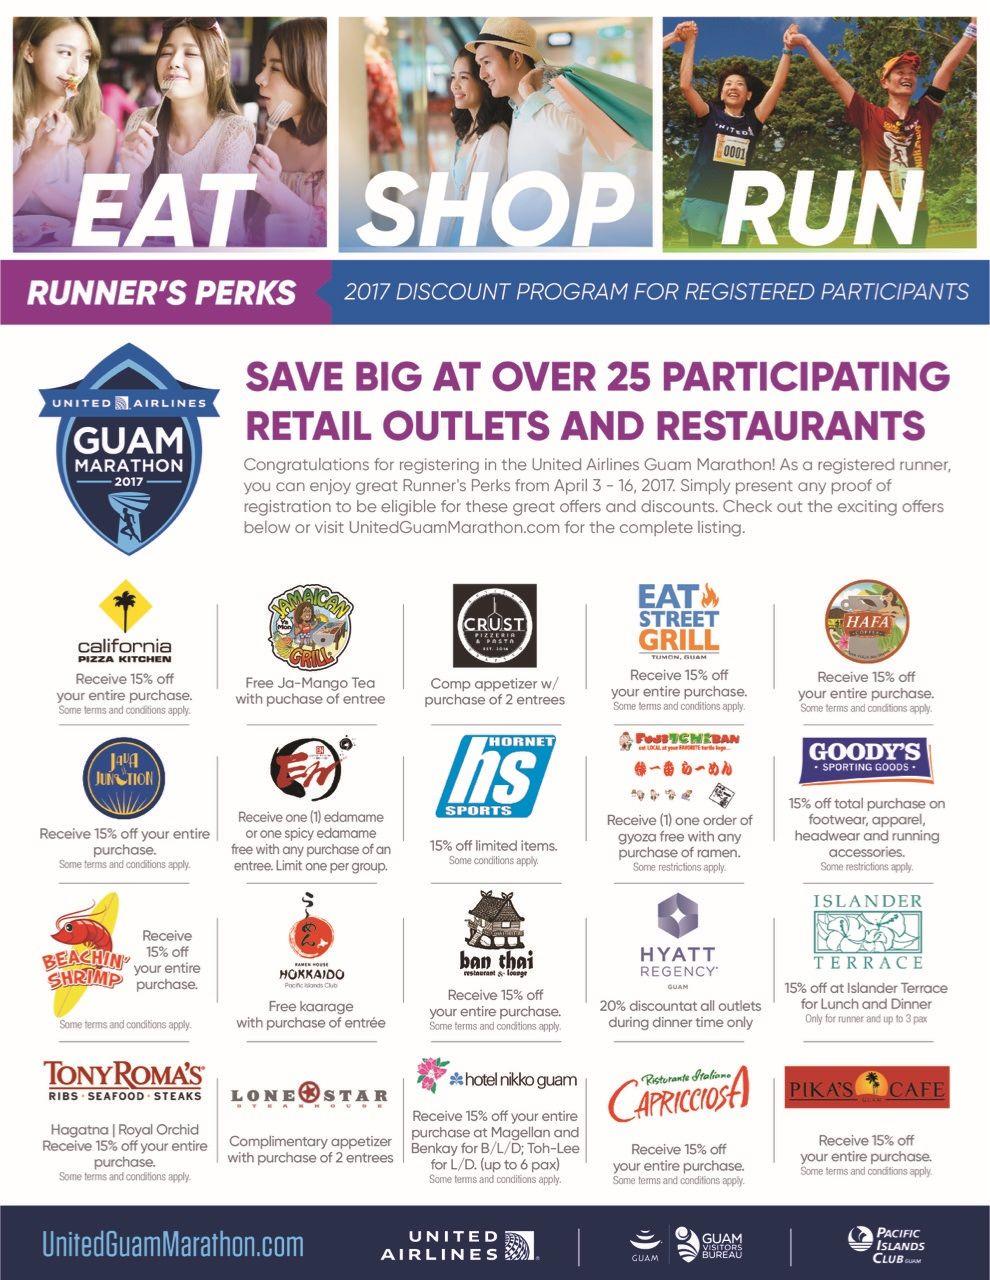 「Eat.Shop.Run」でグアムを楽しもう